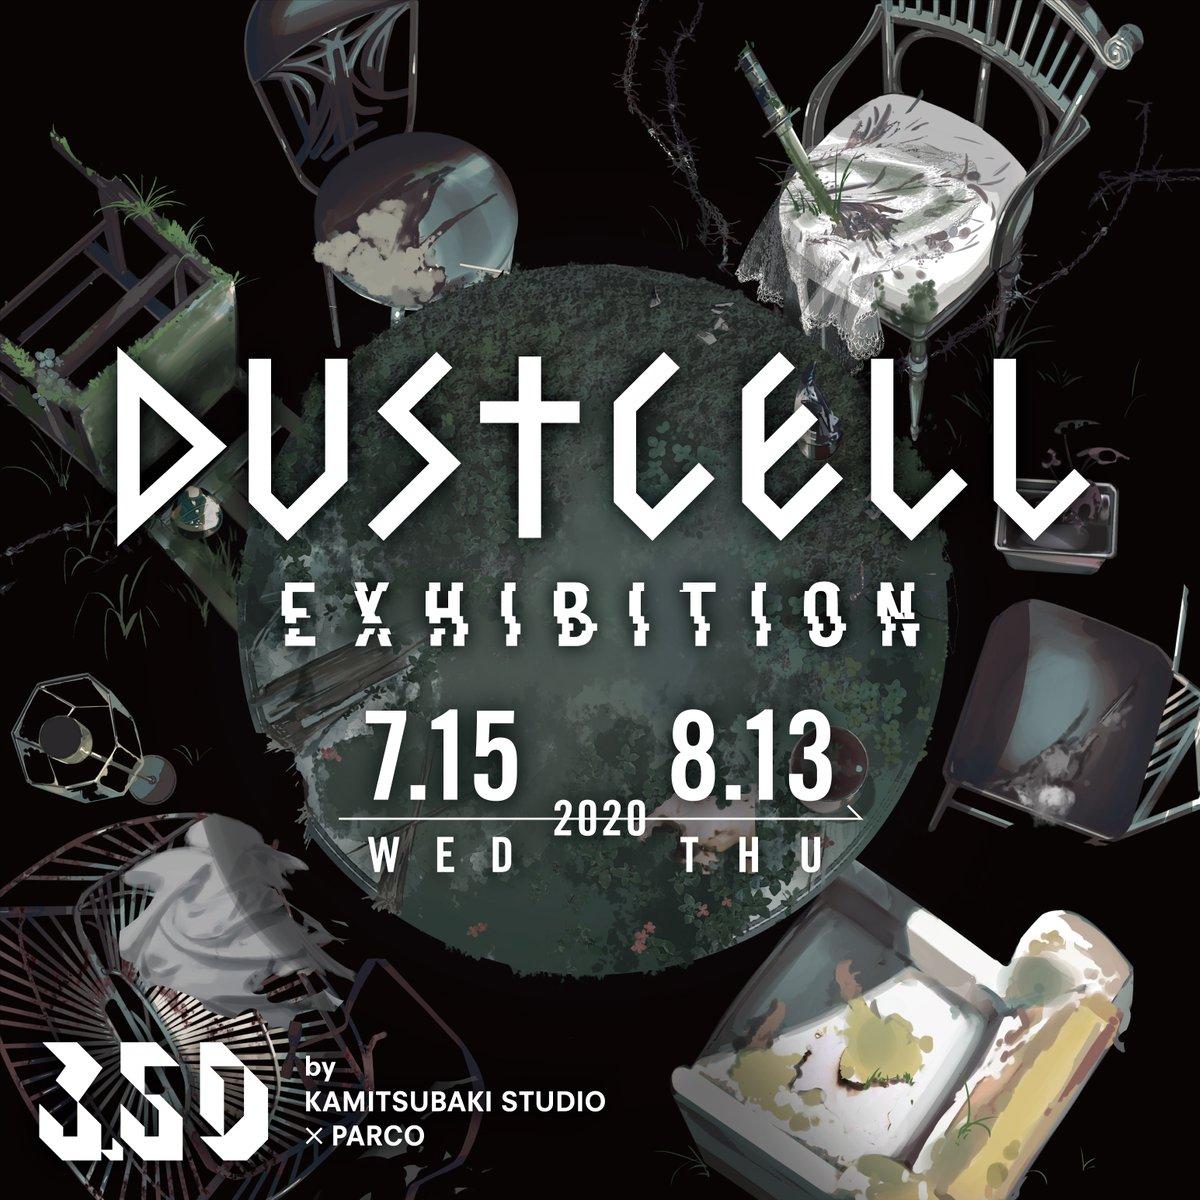 「DUSTCELL展」の開催が決定しました 新作グッズ販売もあります。開催期間: 2020年7月15日(水)〜8月13日(木)場所:3.5D by KAMITSUBAKI STUDIO × PARCO※入場無料詳細: